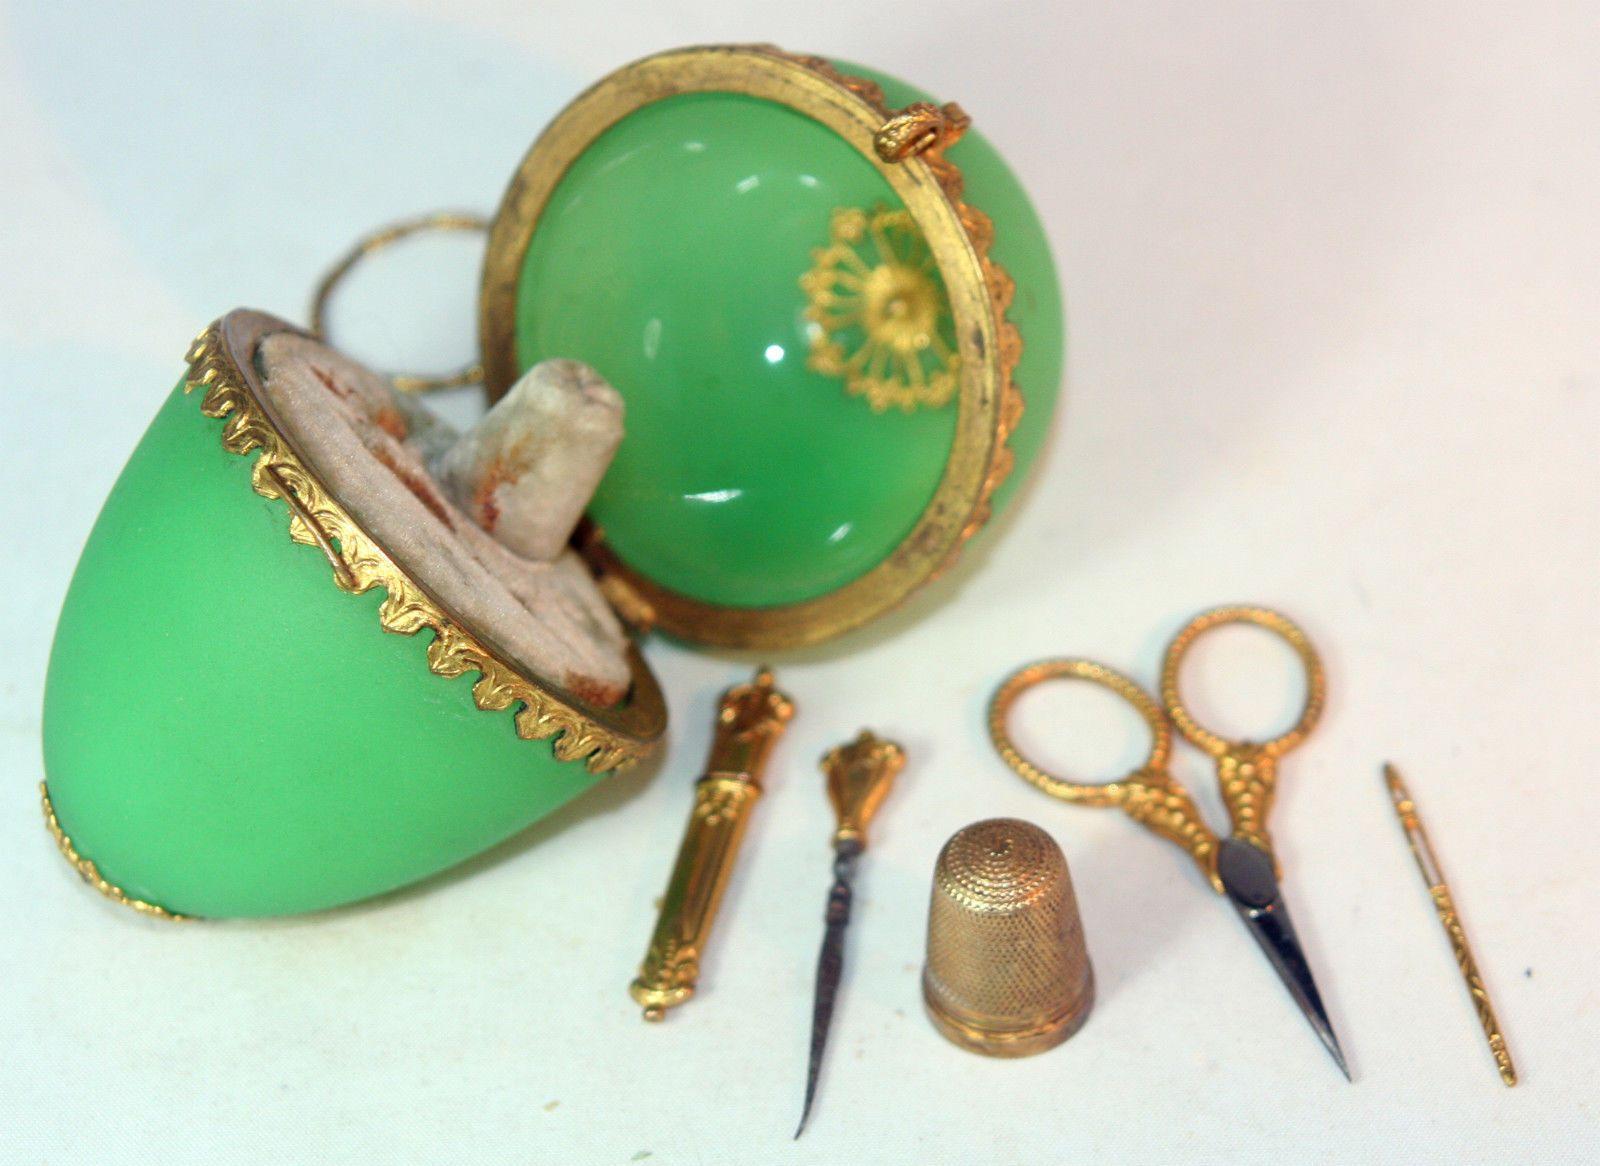 Antique c1860 Palais Royal Complete Etui Green Ormolu Chatelaine Original Ring | eBay